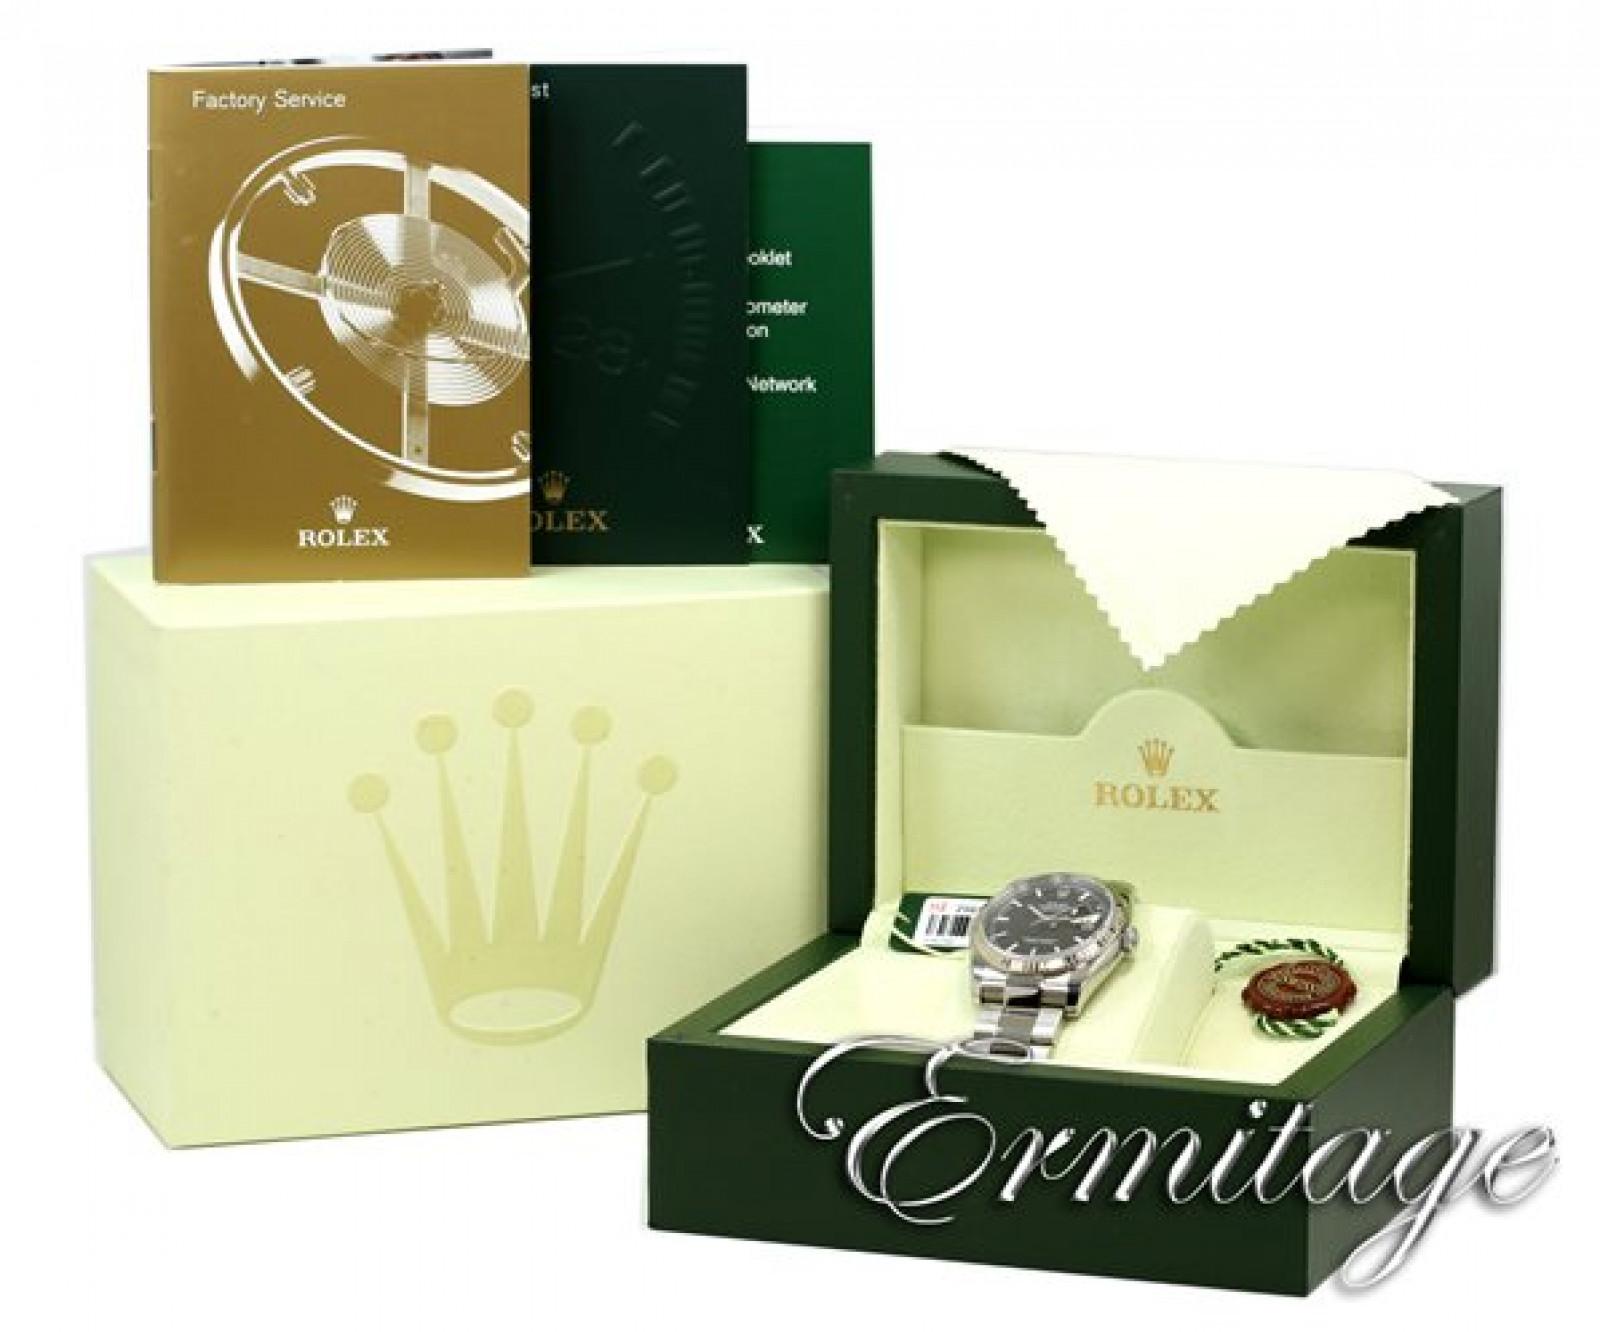 Sell Rolex Datejust 116234